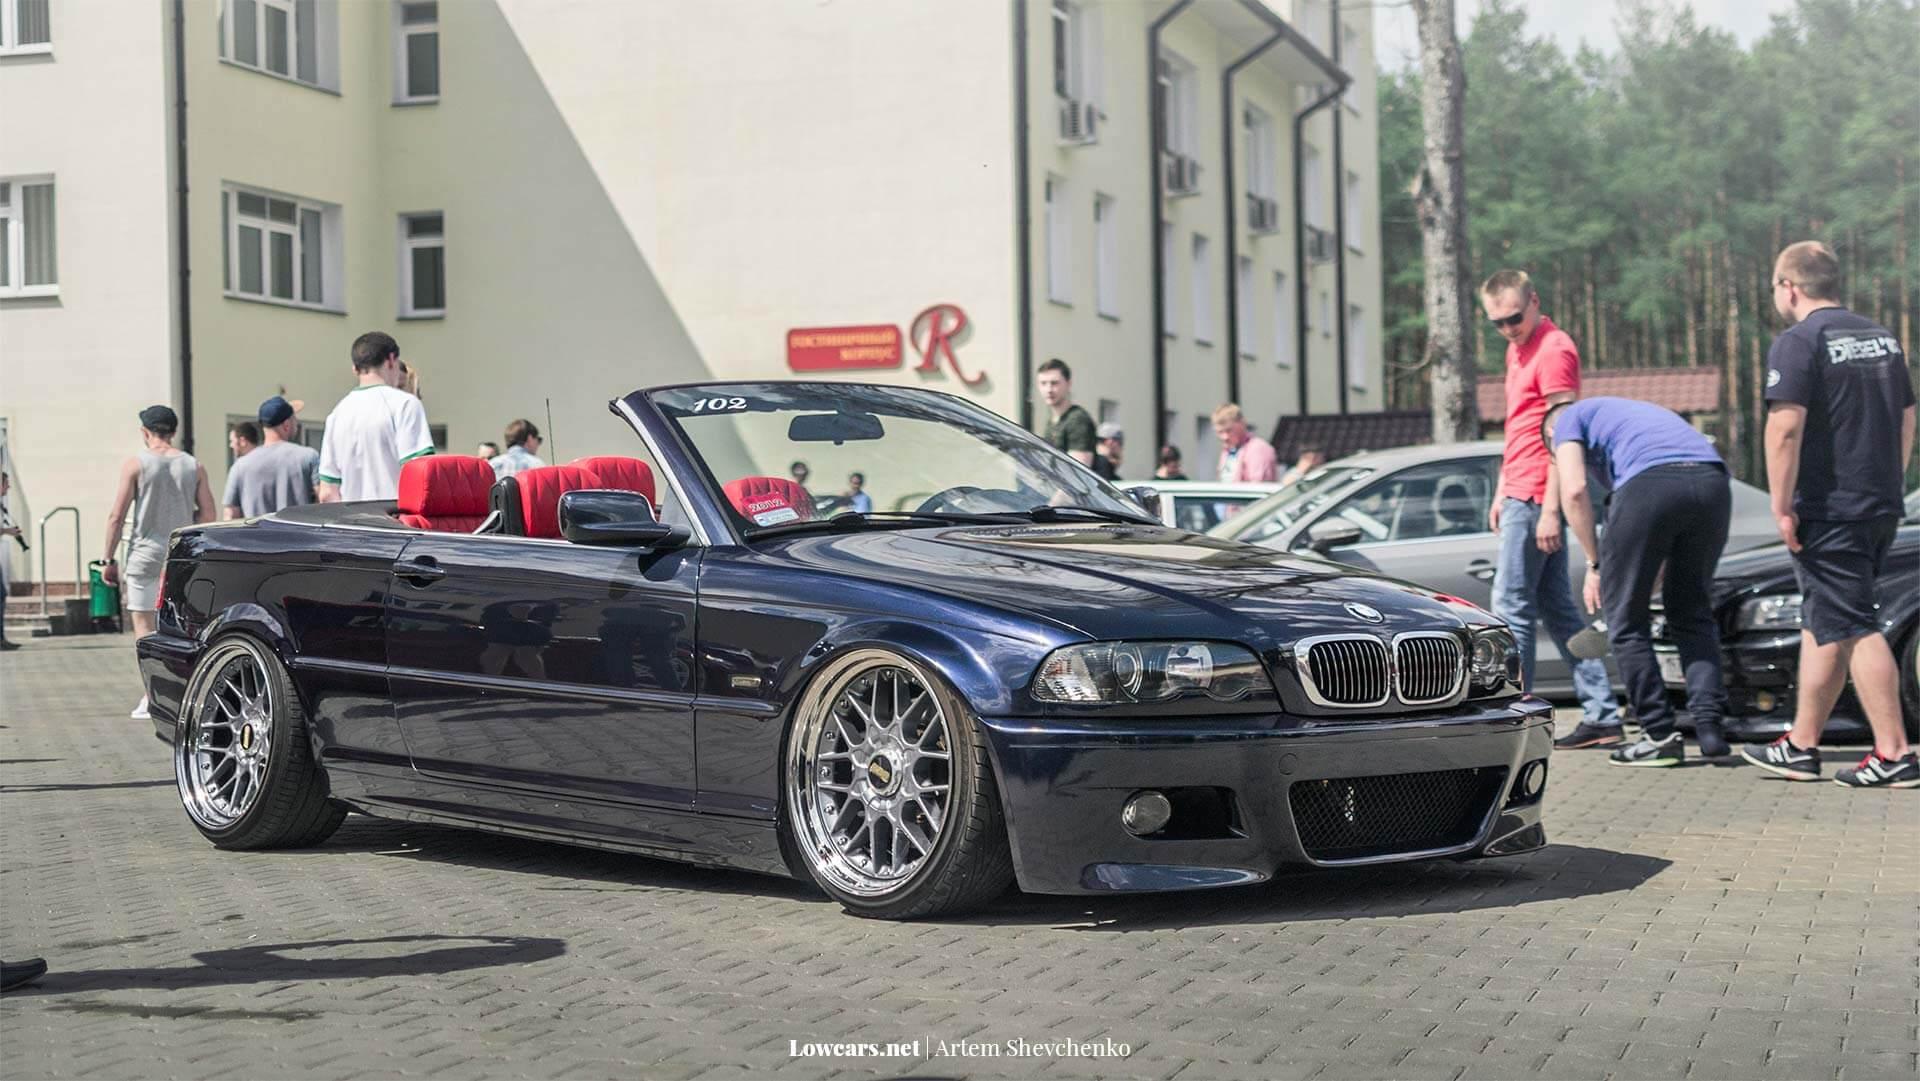 Виталий Коронец (BMW e46 Cabrio)